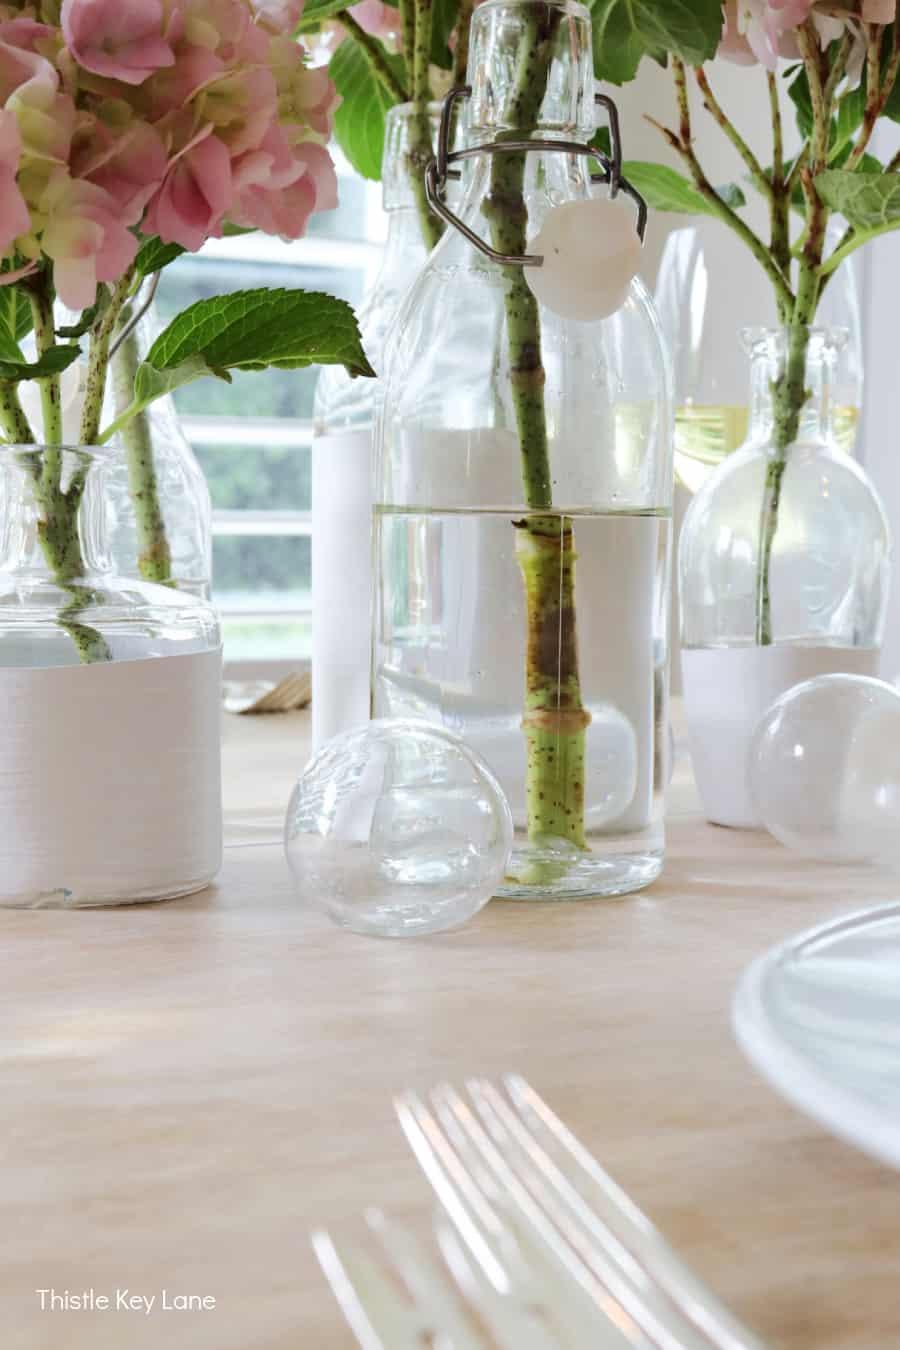 Glass fishing floats arranged around bottle vases. Summer Tablescape With Glass Bottle Vases.